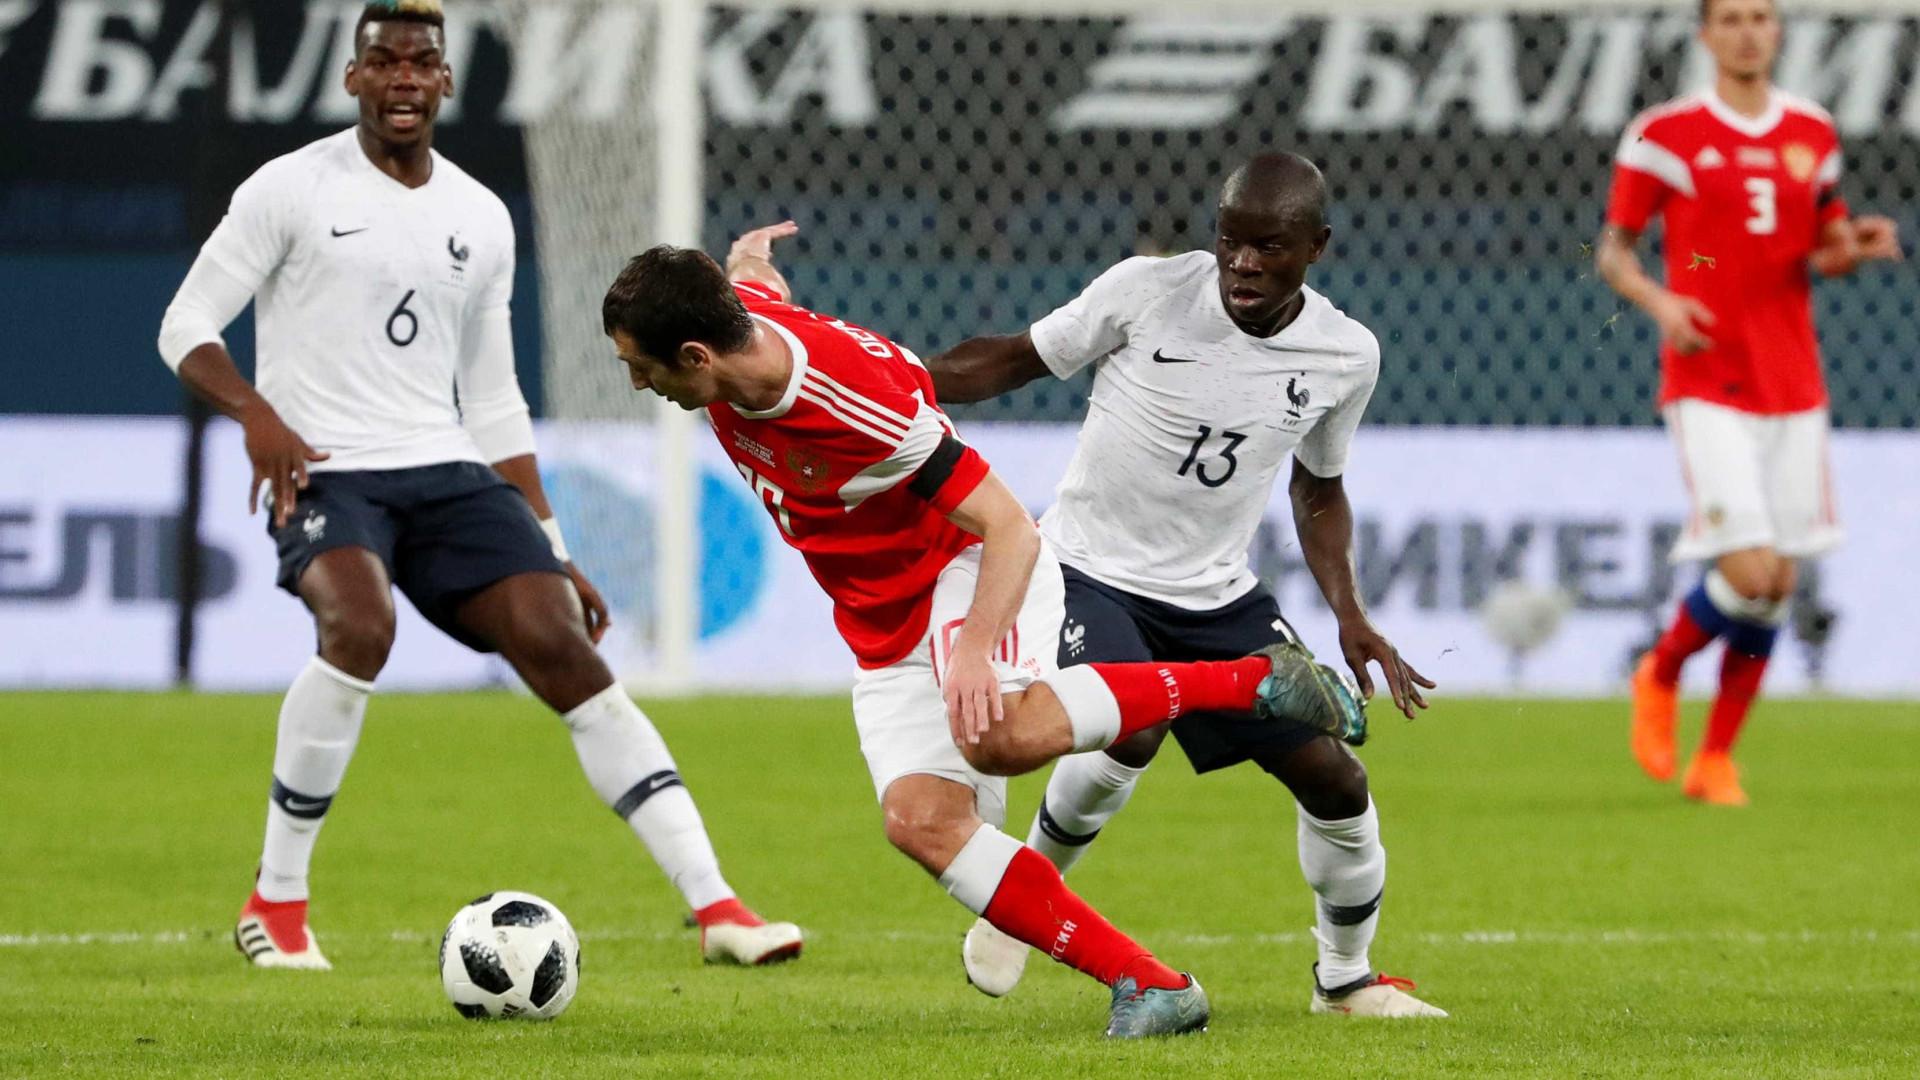 Rússia responderá na Fifa por racismo a menos de dois meses da Copa